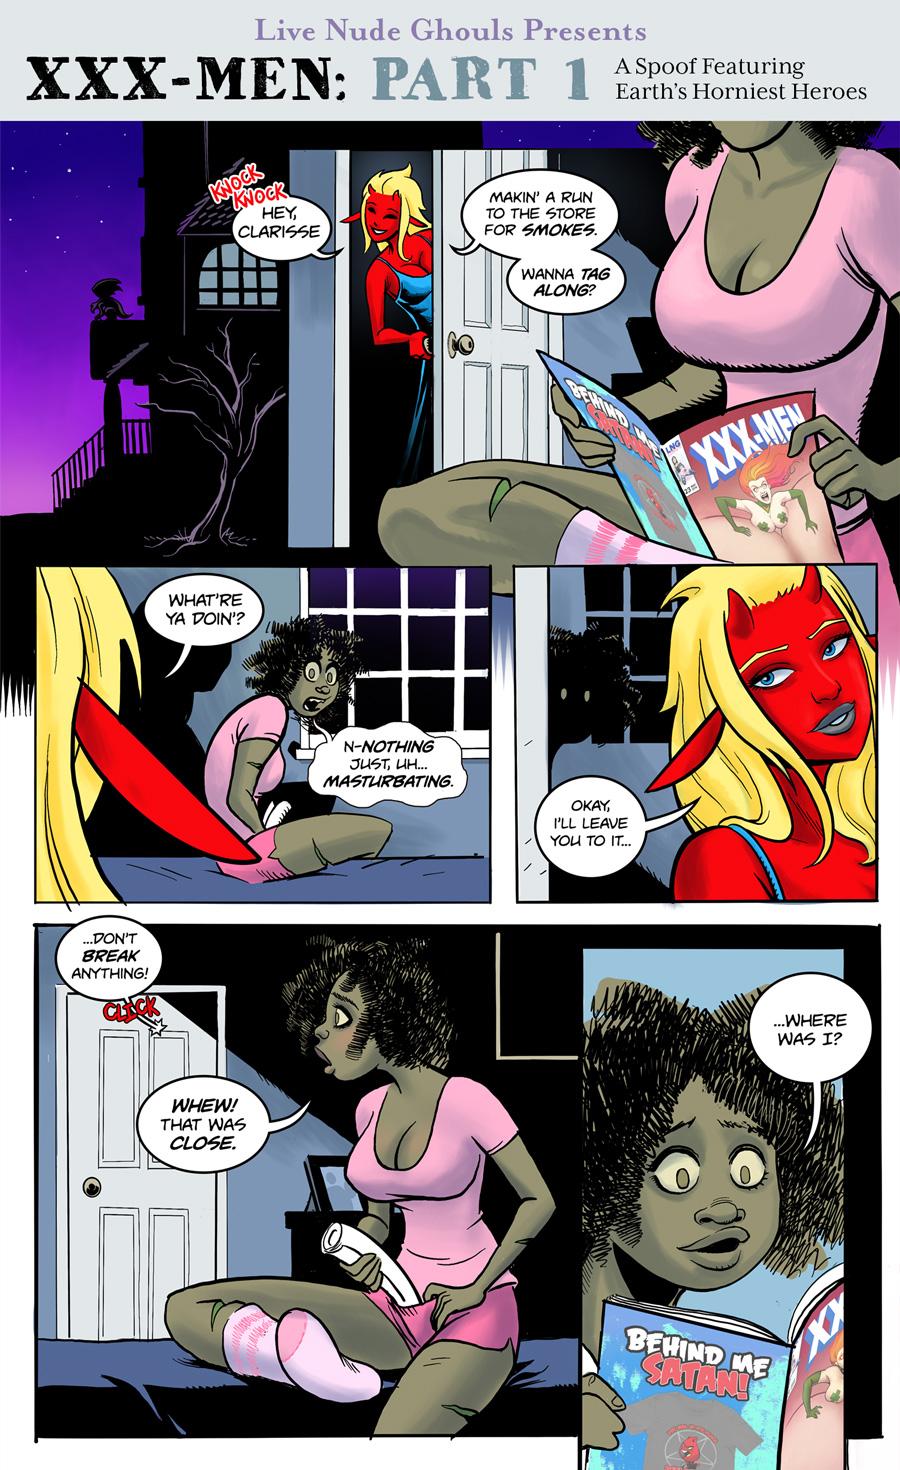 XXX-Men: Part 1 – A Live Nude Ghouls Spoof Comic